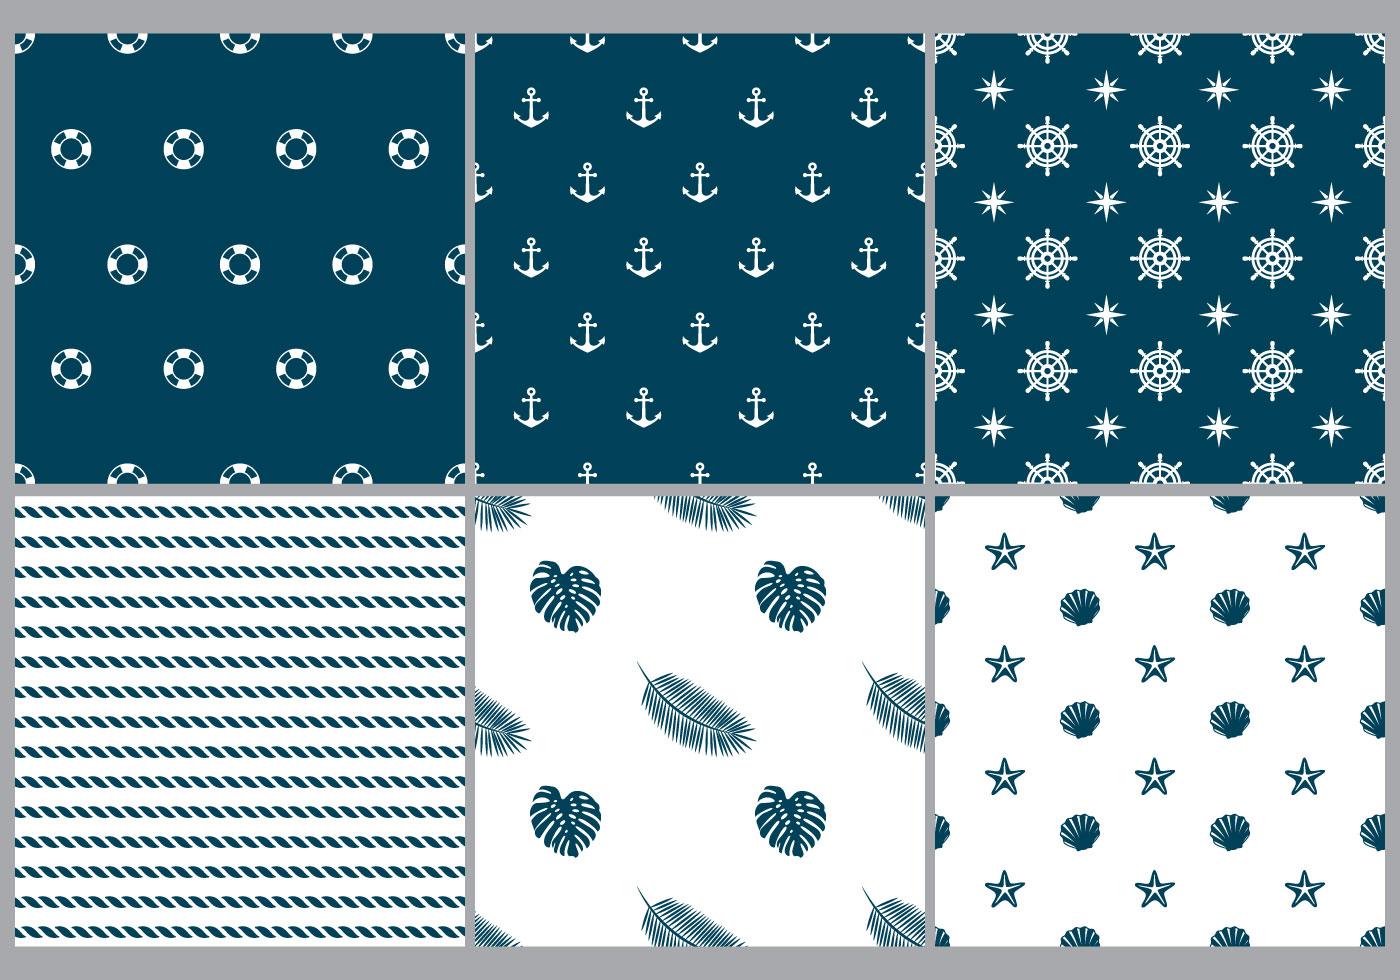 beach monochromatic patterns download free vector art